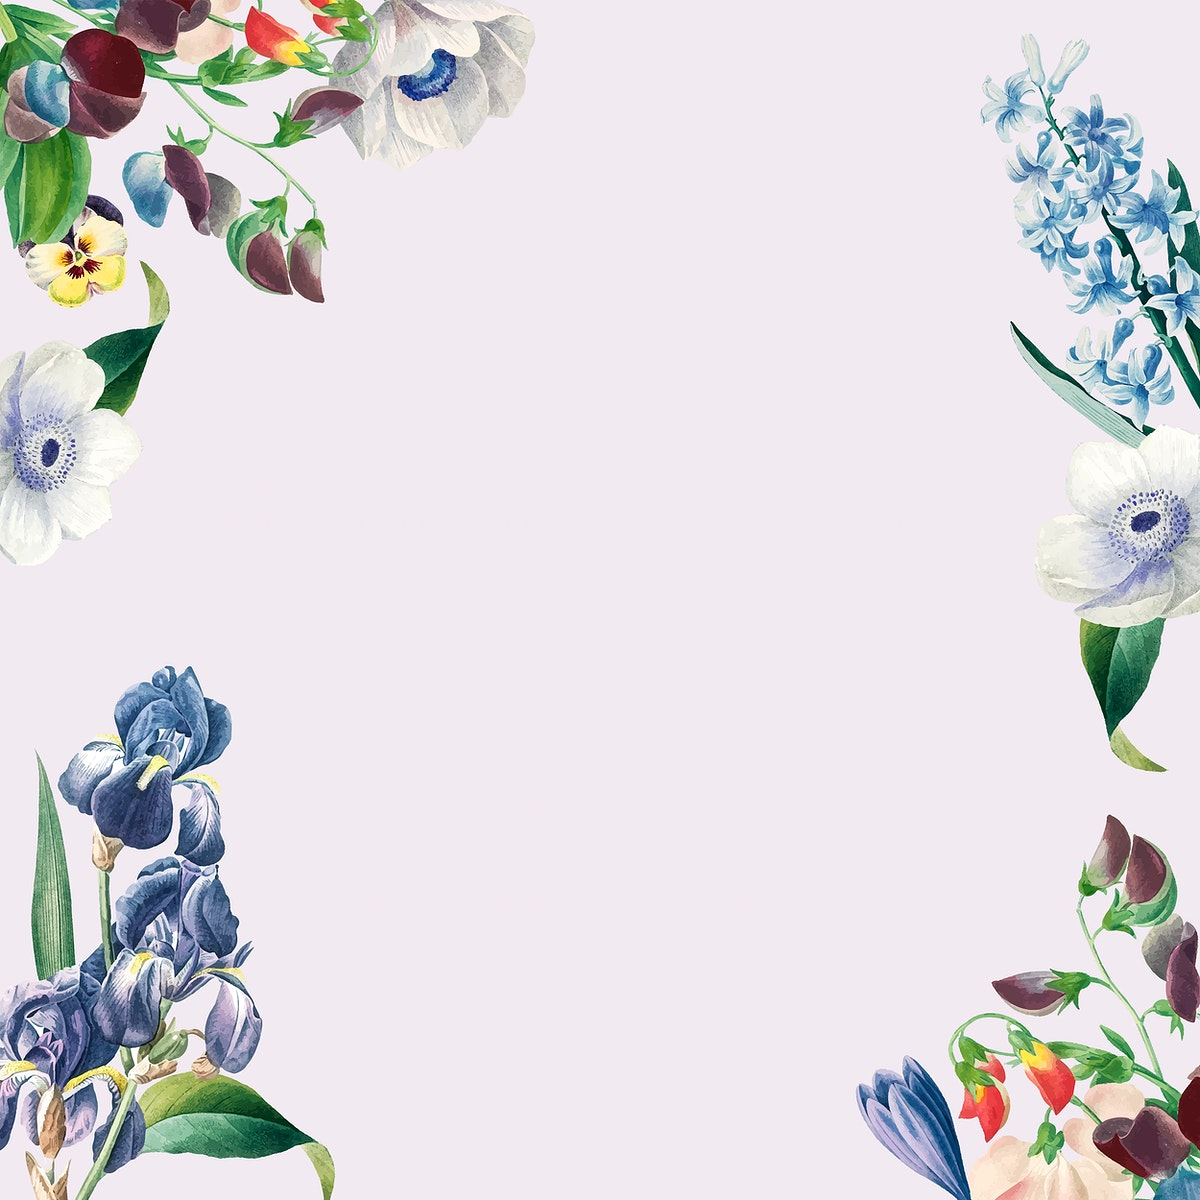 Blue spring flowers decorated frame design element